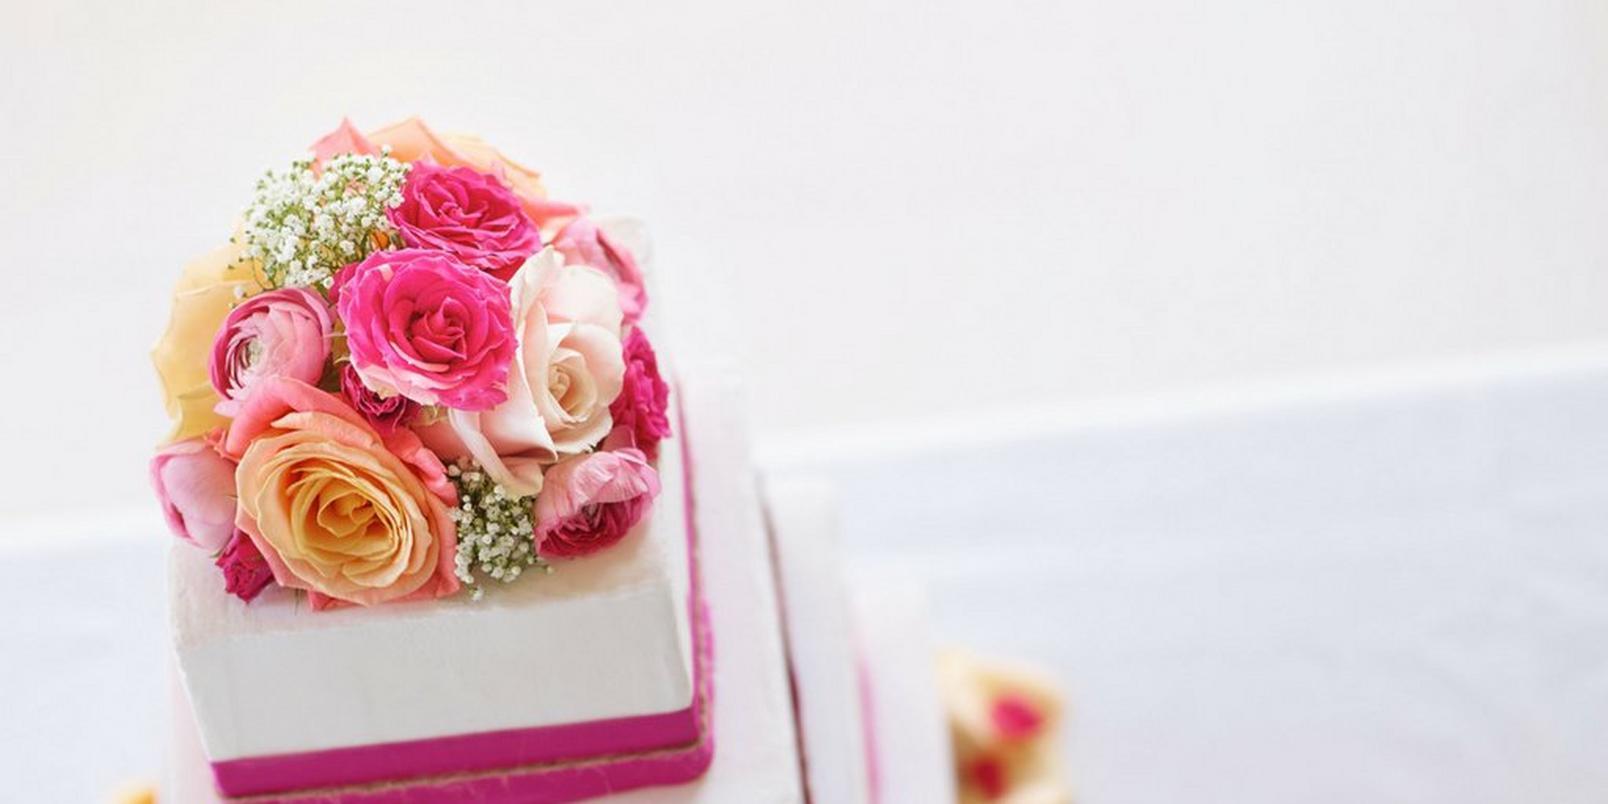 wedding-cake-real-flowers